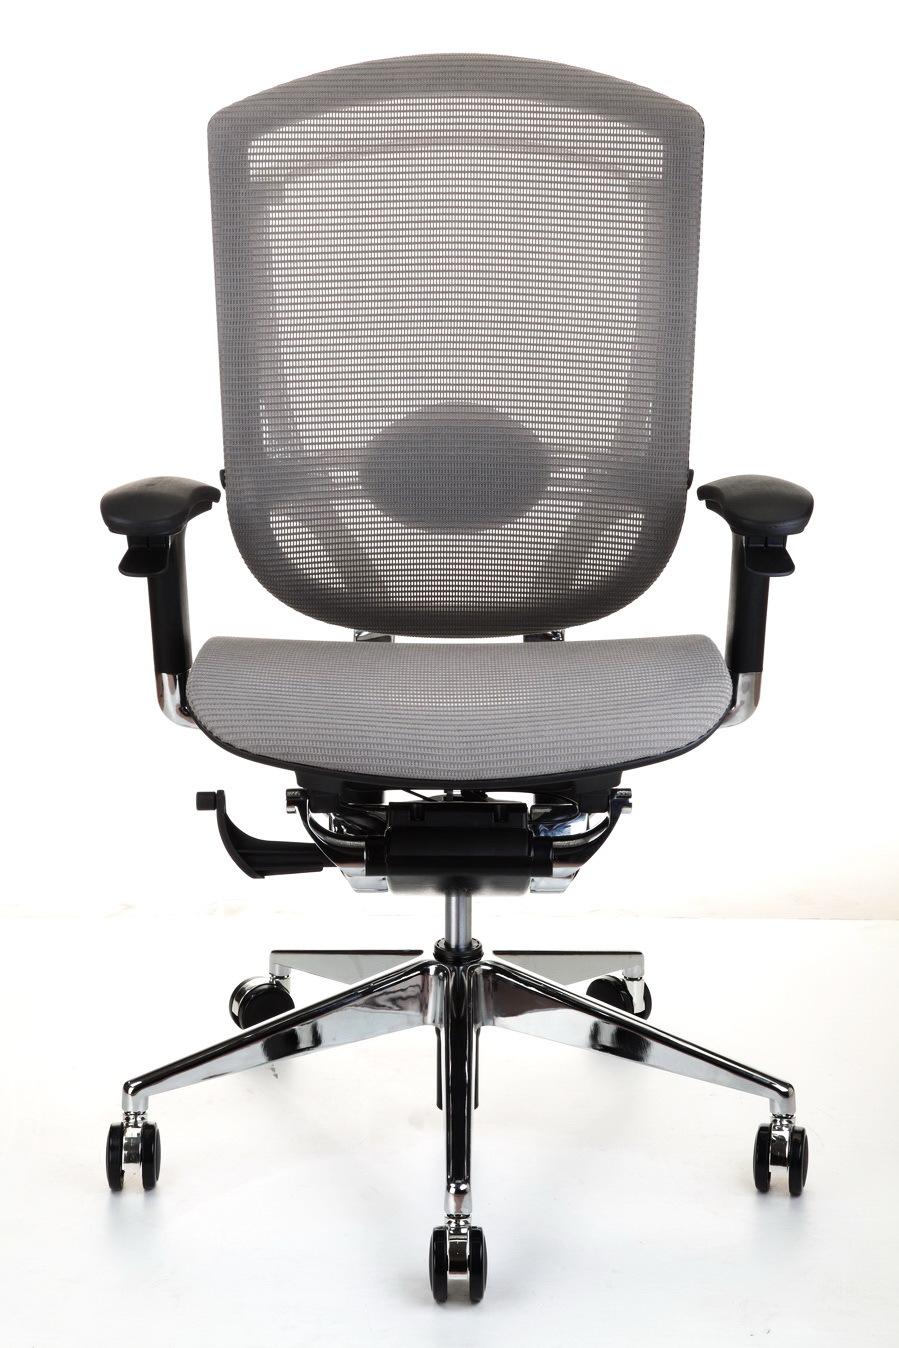 hot sale computer ergonomic swivel office chair buy ergonomic swivel office chair computer. Black Bedroom Furniture Sets. Home Design Ideas